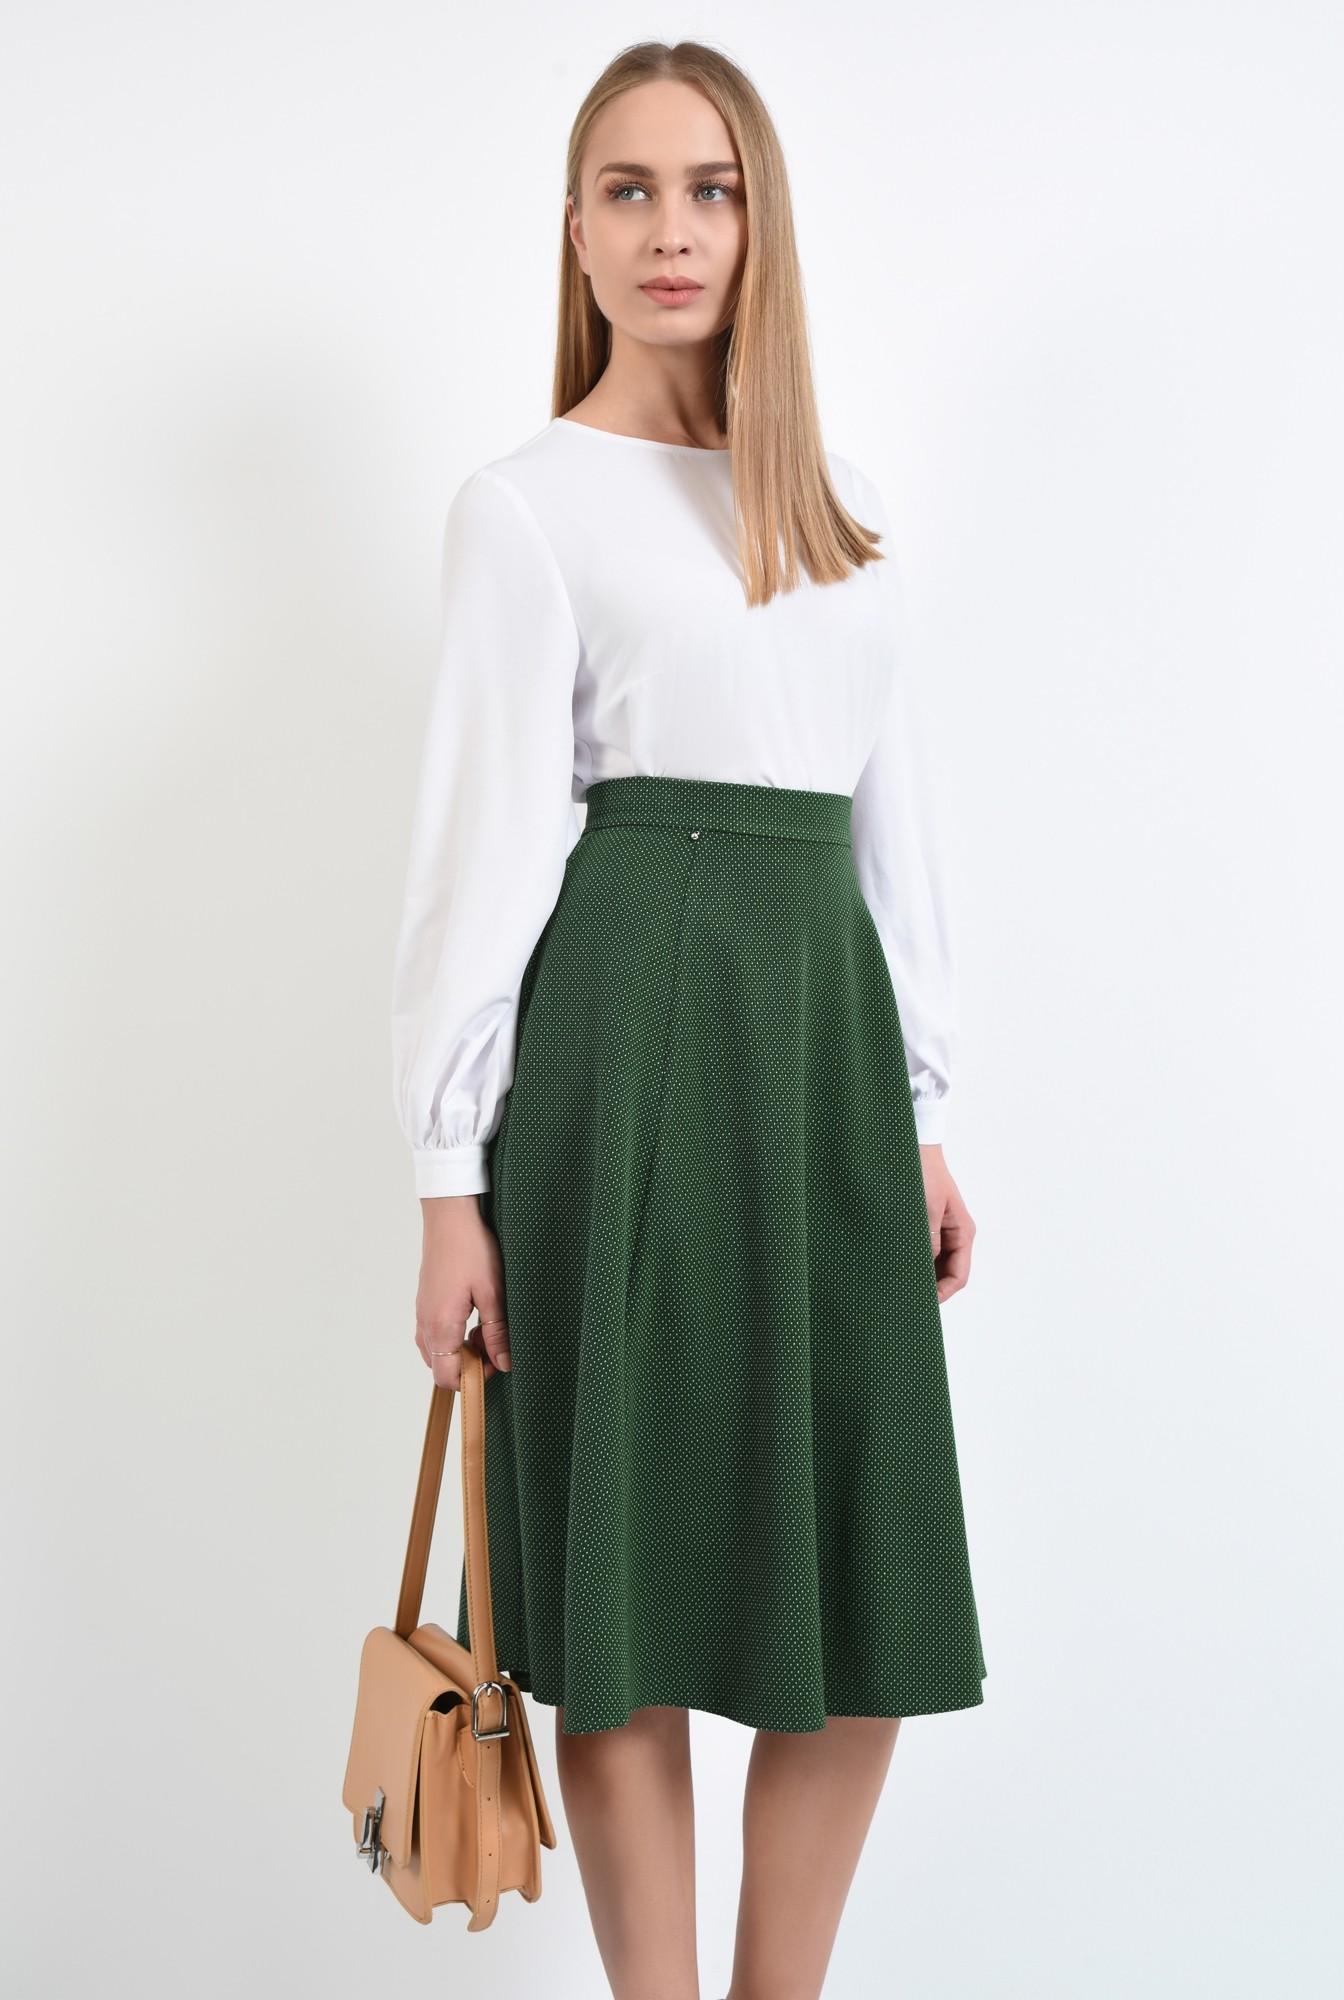 2 - fusta de zi, evazata, verde, cu picouri albe, cu talie inalta